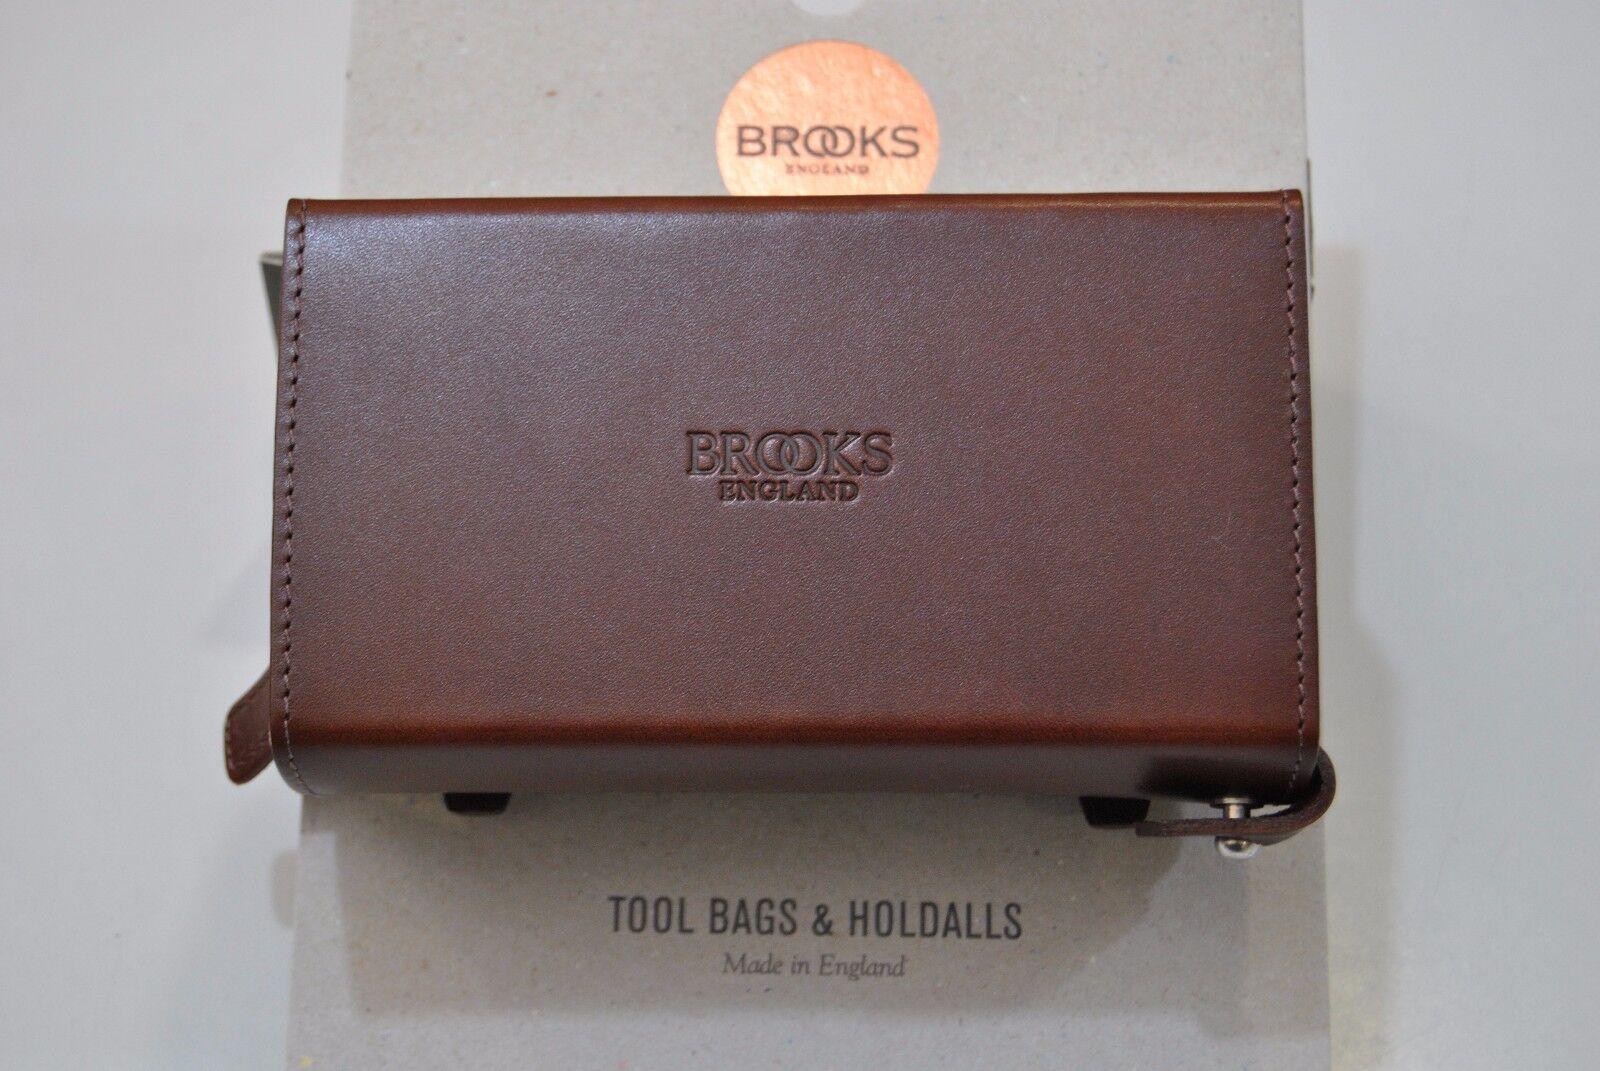 Borsello Sottosella BROOKS D-SHAPED Marronee Antico D-SHAPED SADDLE SADDLE SADDLE TOOL BAGS BRO 146d08